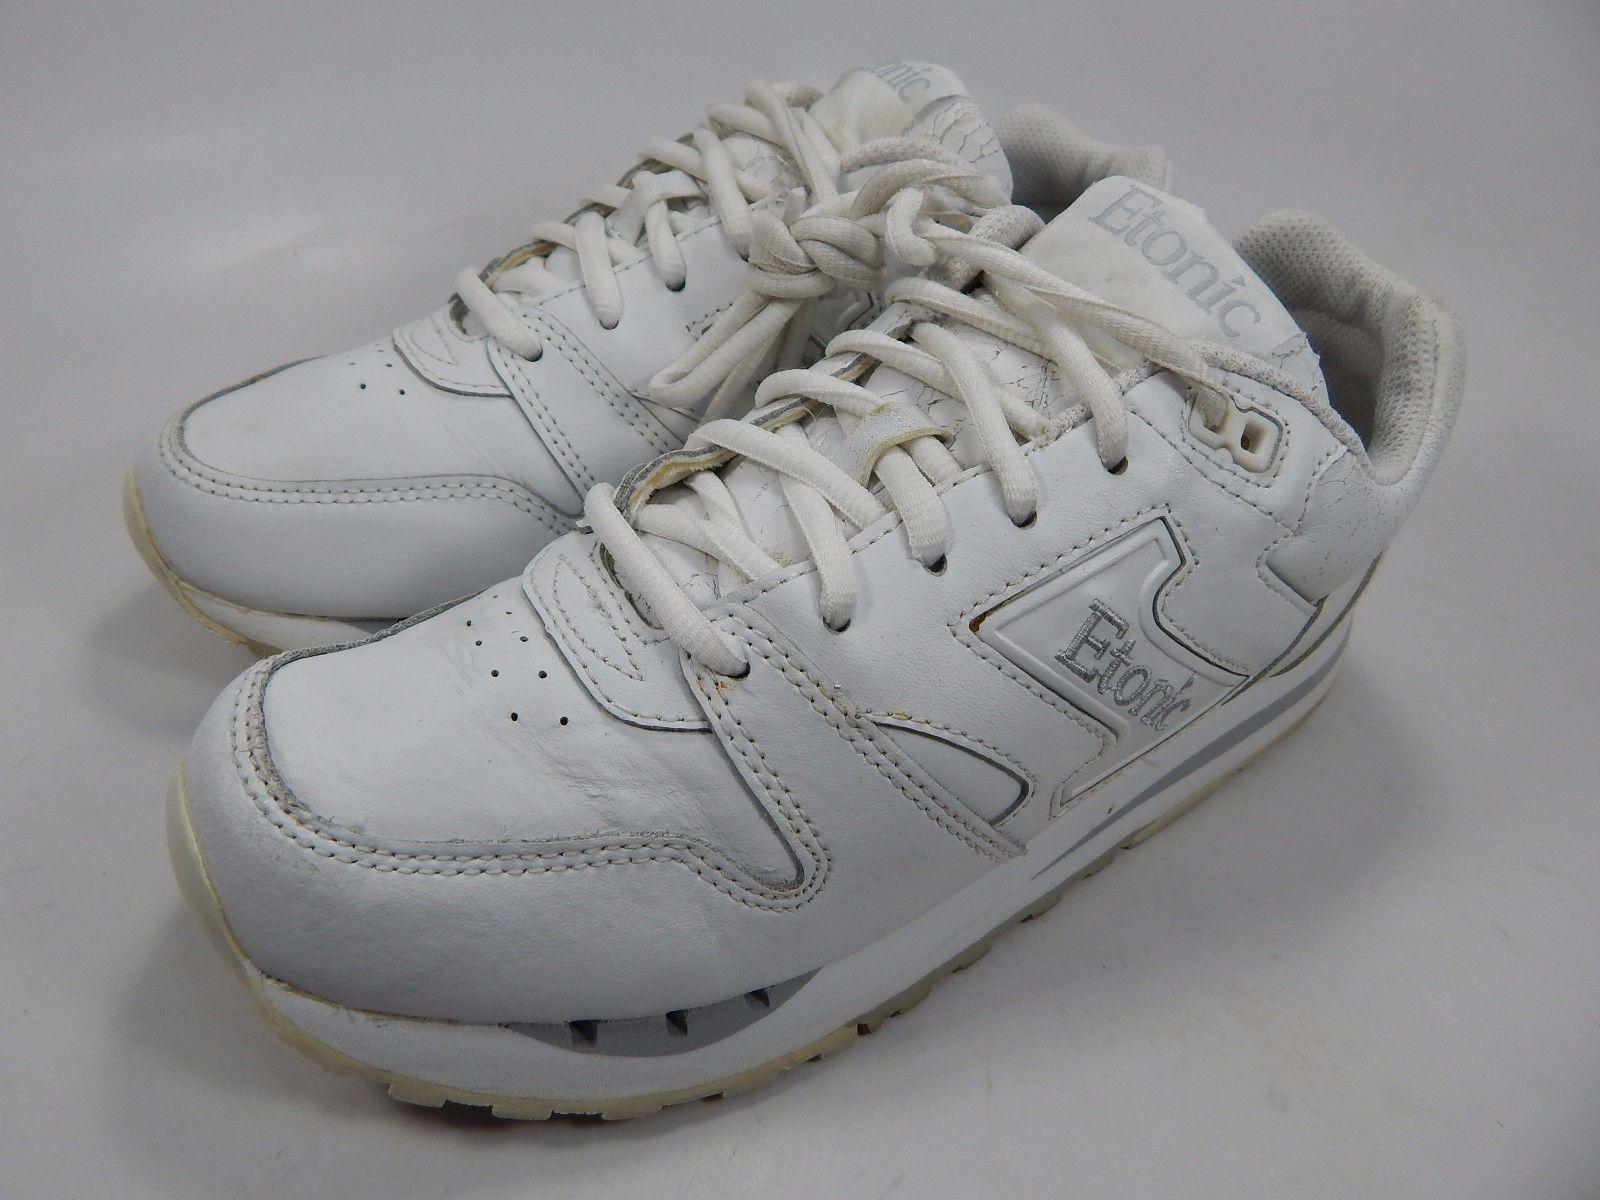 Etonic Trans Am Women's Trainer Shoes Size US 7 M (B) EU 38 White